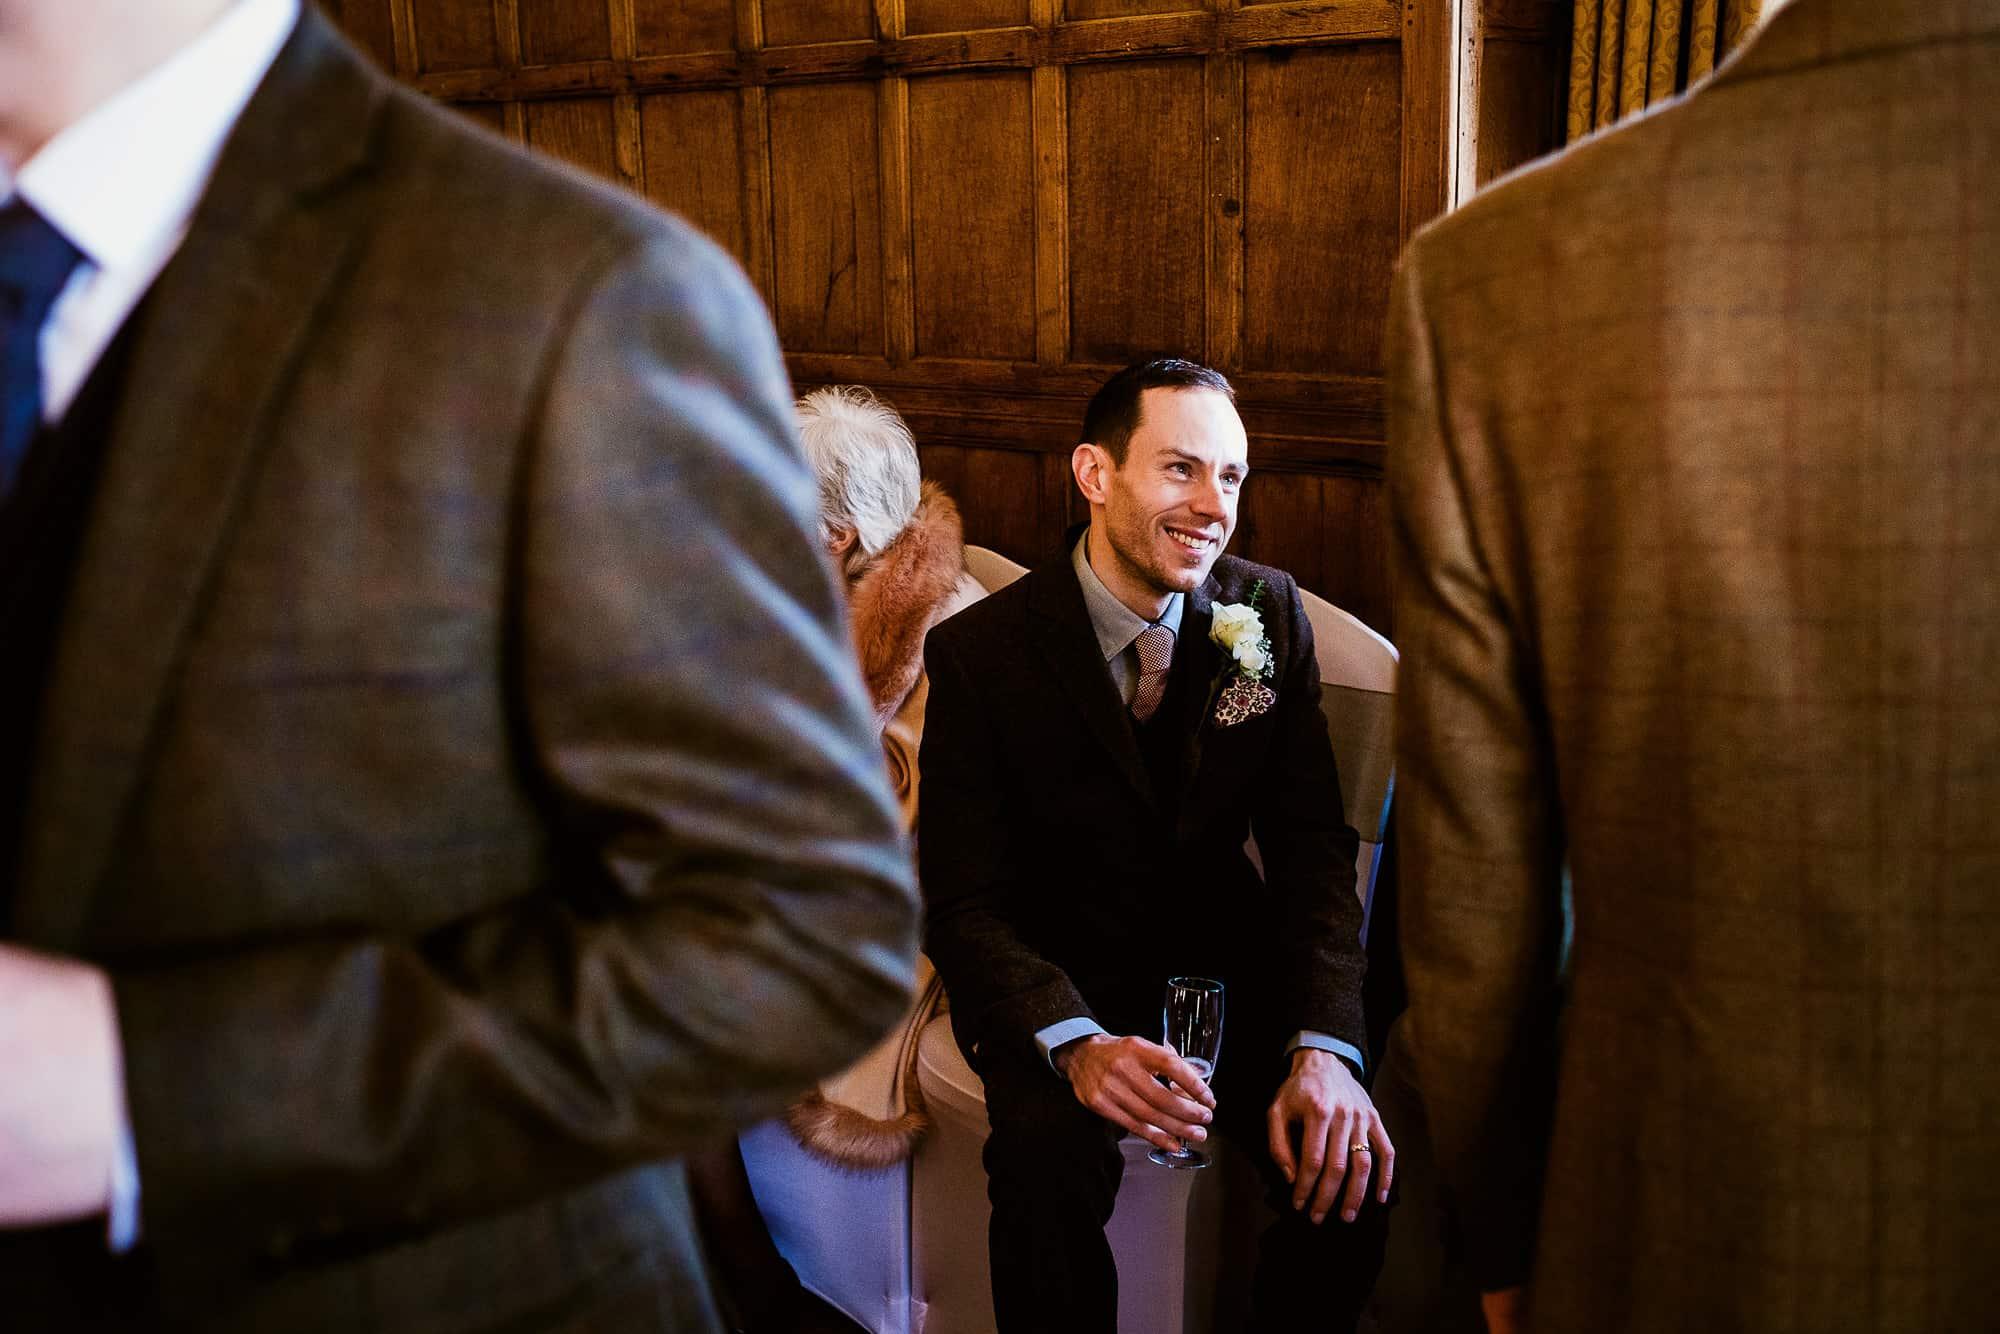 lympne-castle-wedding-photographer-matt-tyler-0021